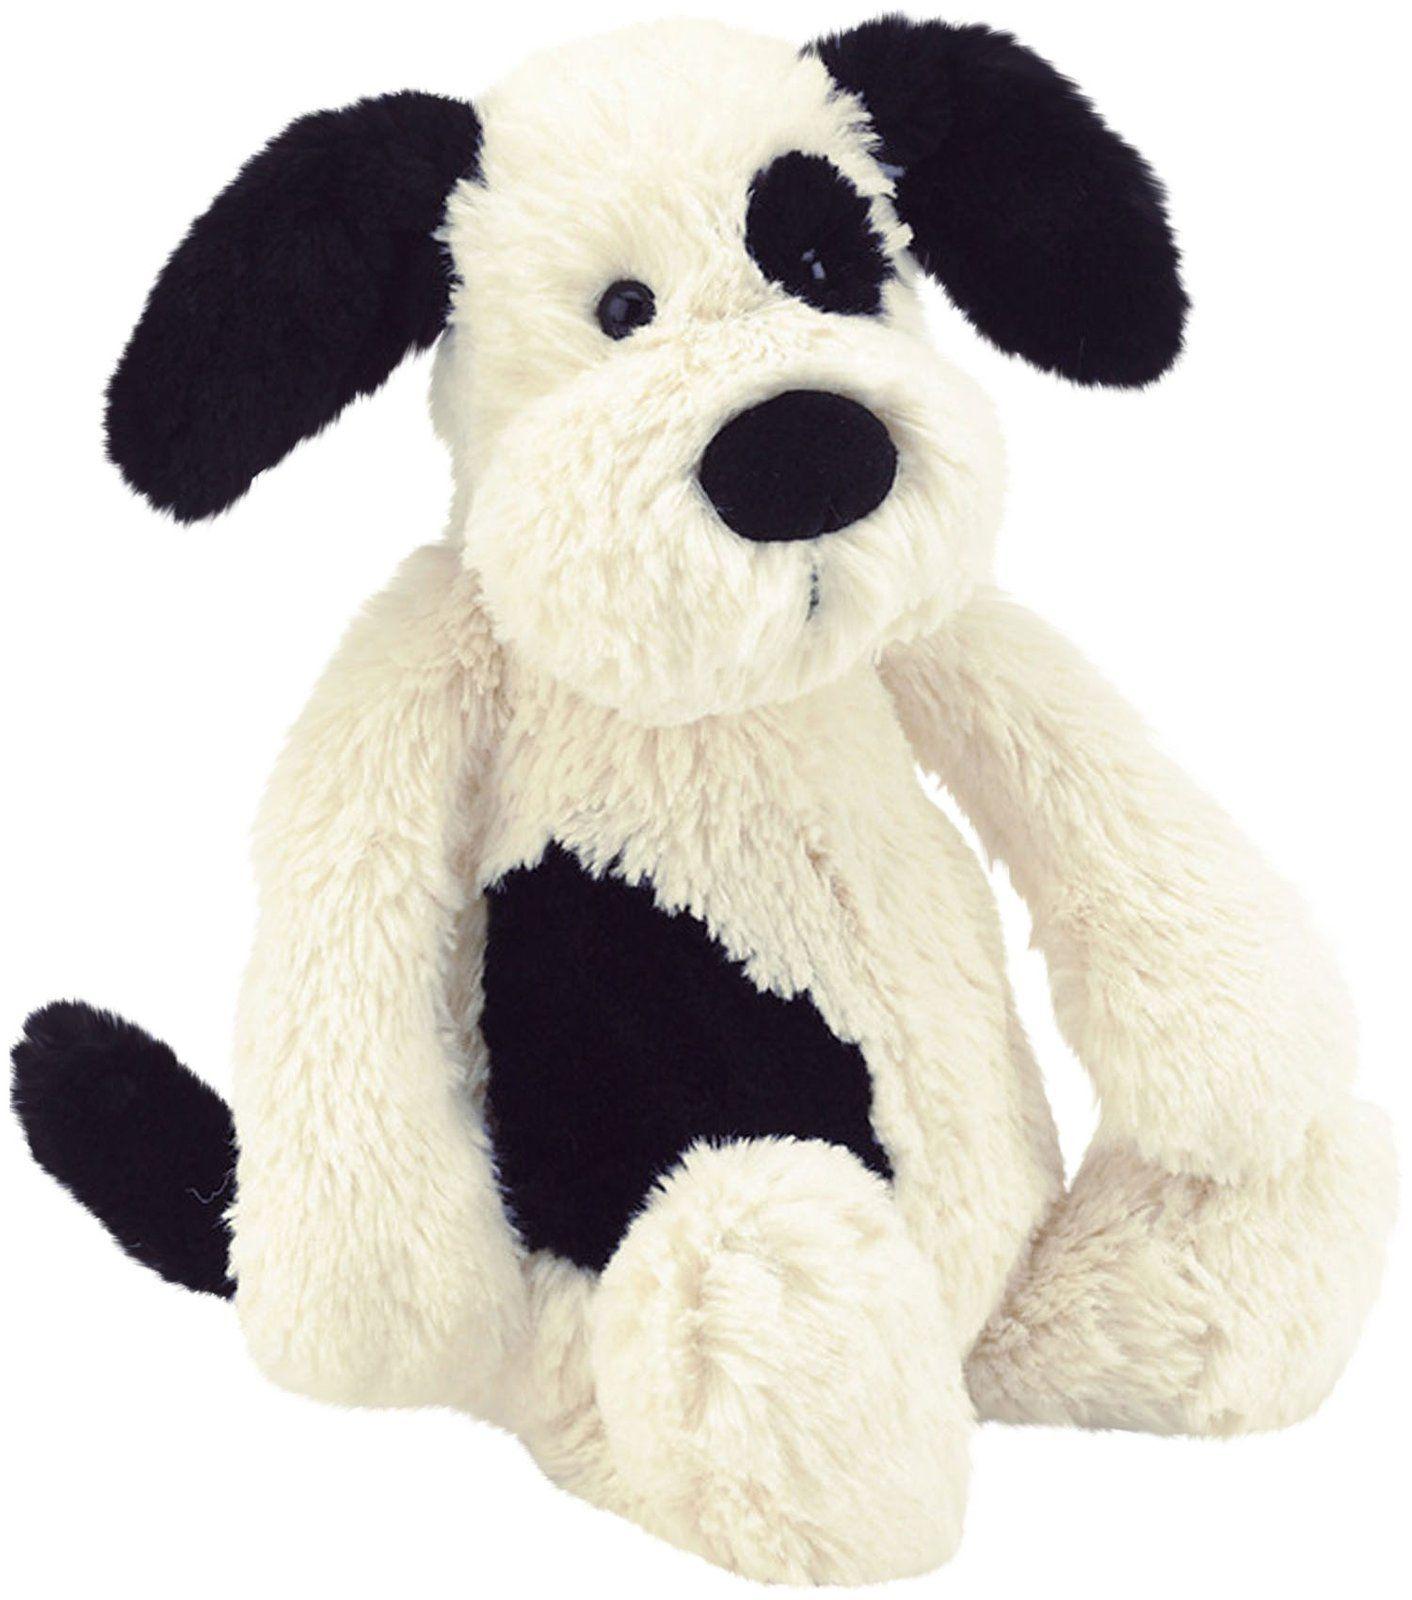 Jellycat Bashful Black Cream Puppy Large 14 Puppy Soft Toy White Puppies Plush Stuffed Animals